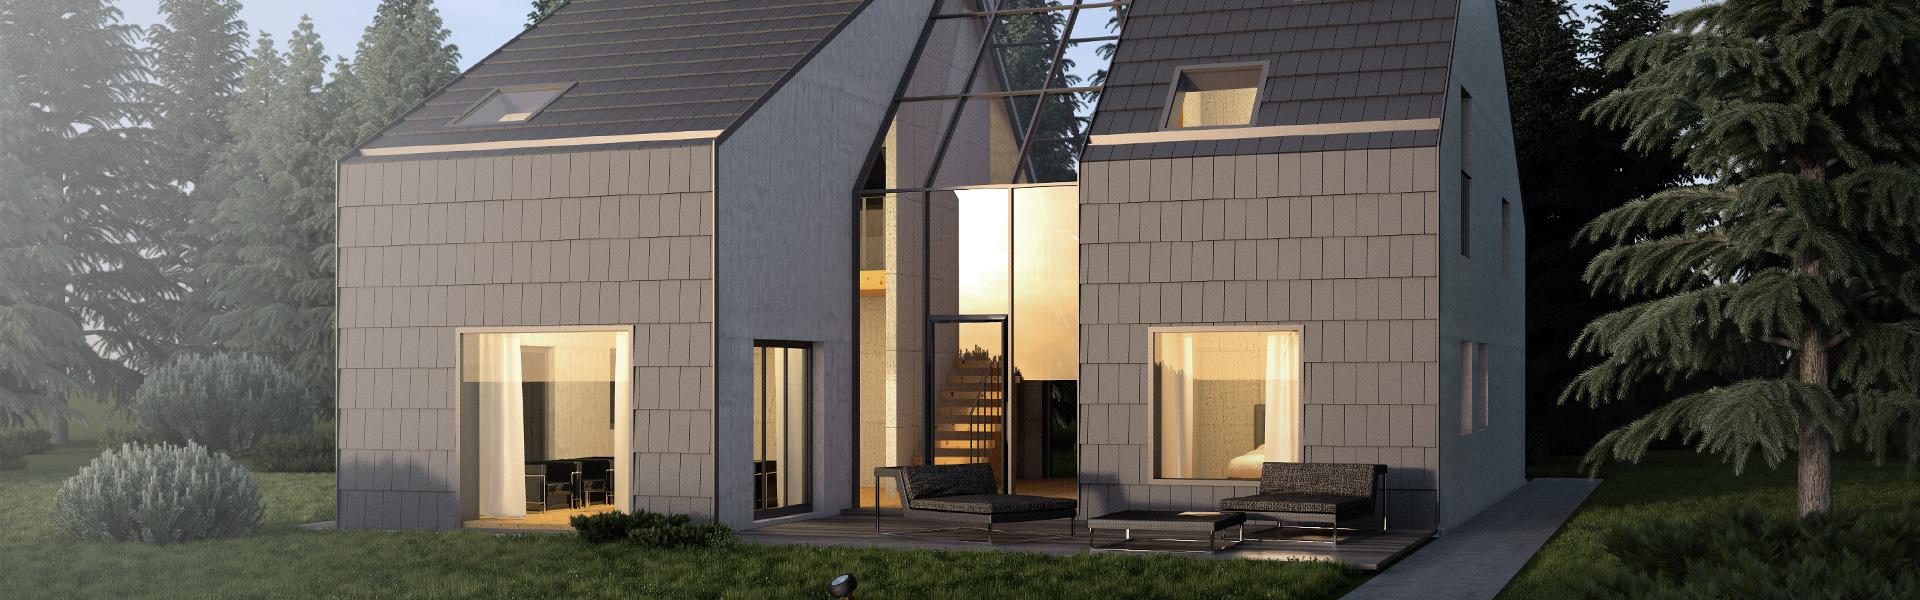 Architektur Rendering architektur rendering altspace de